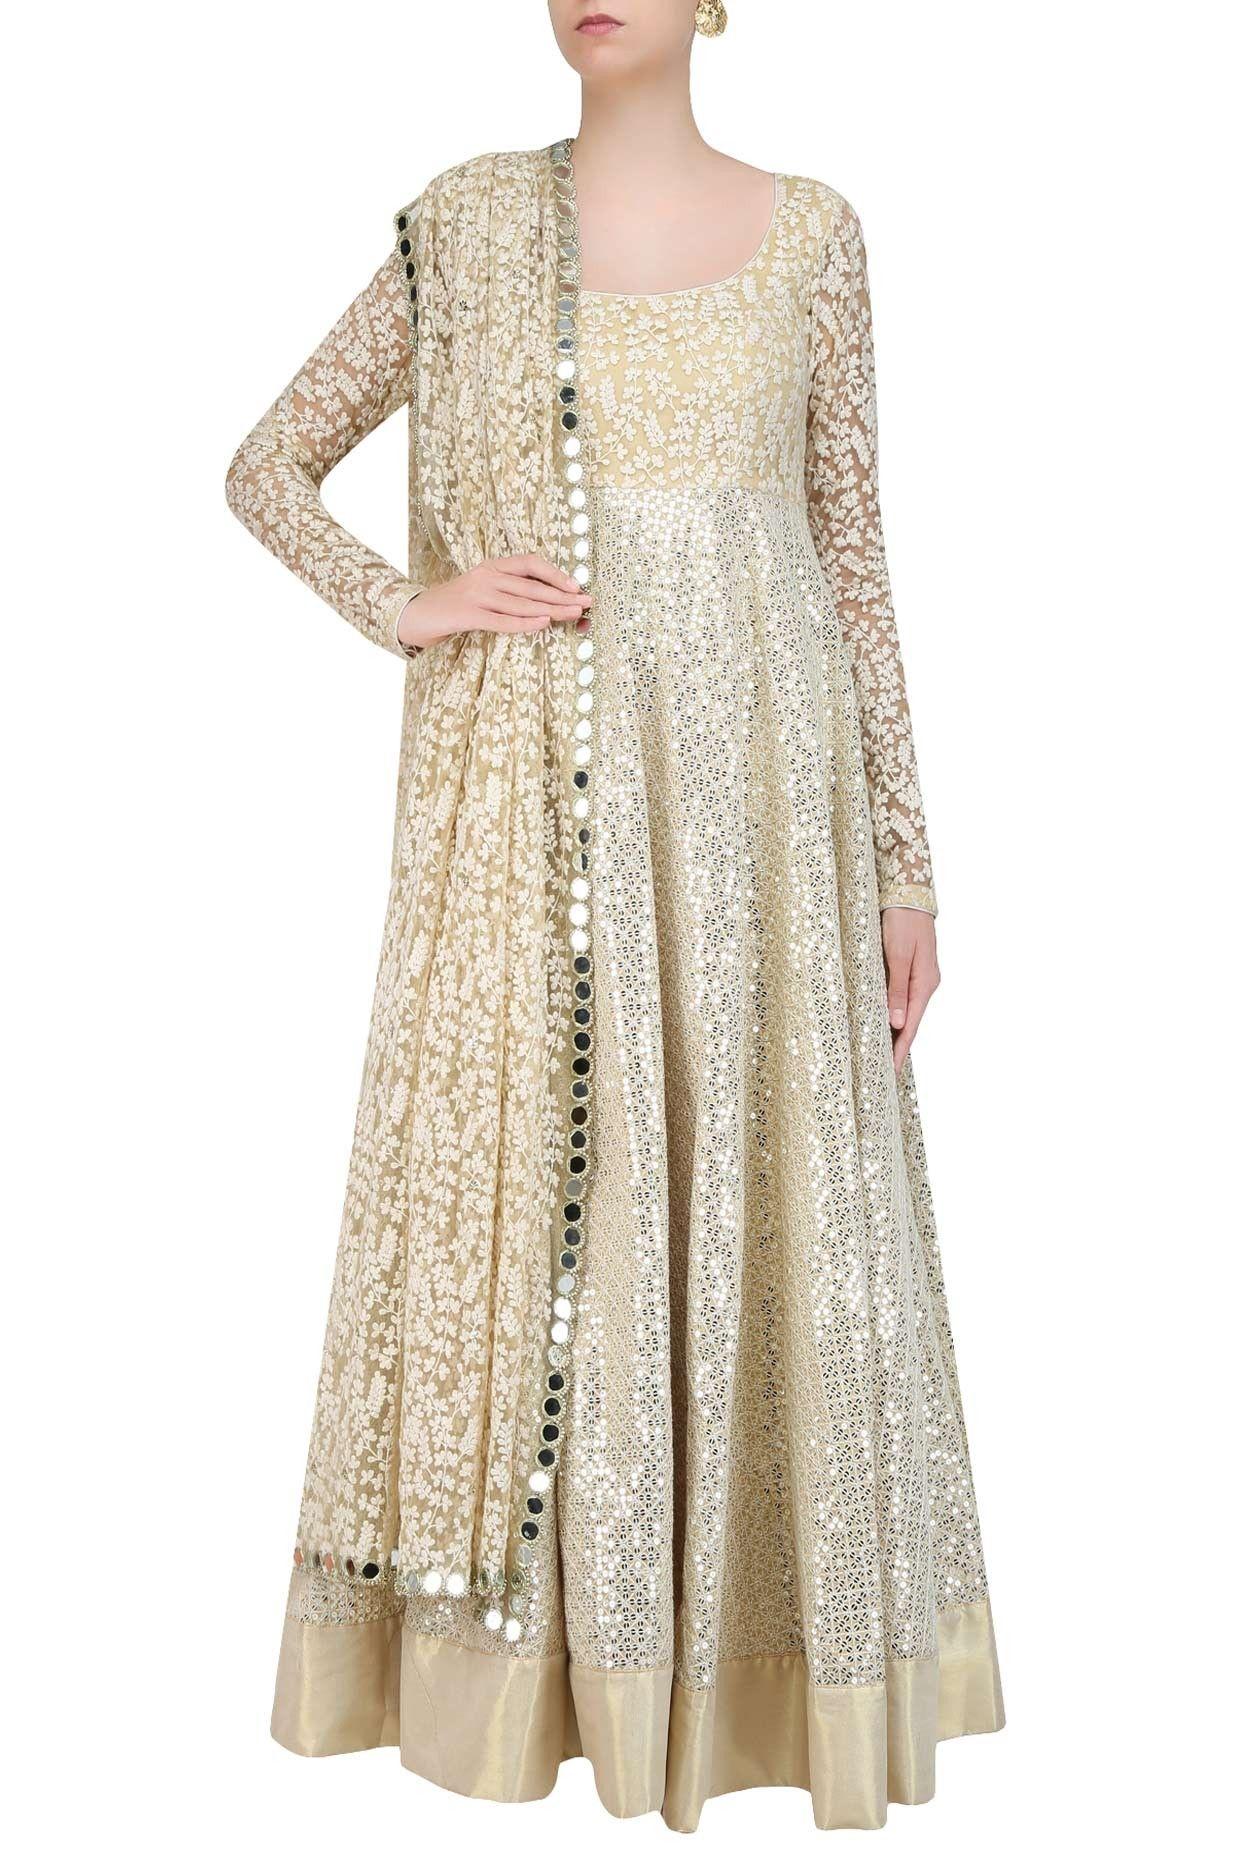 b94ab7076f Buy Latest Designer Dresses, Latest Designer Sarees, Salwar Kameez,  Jewellery, Accessories Online